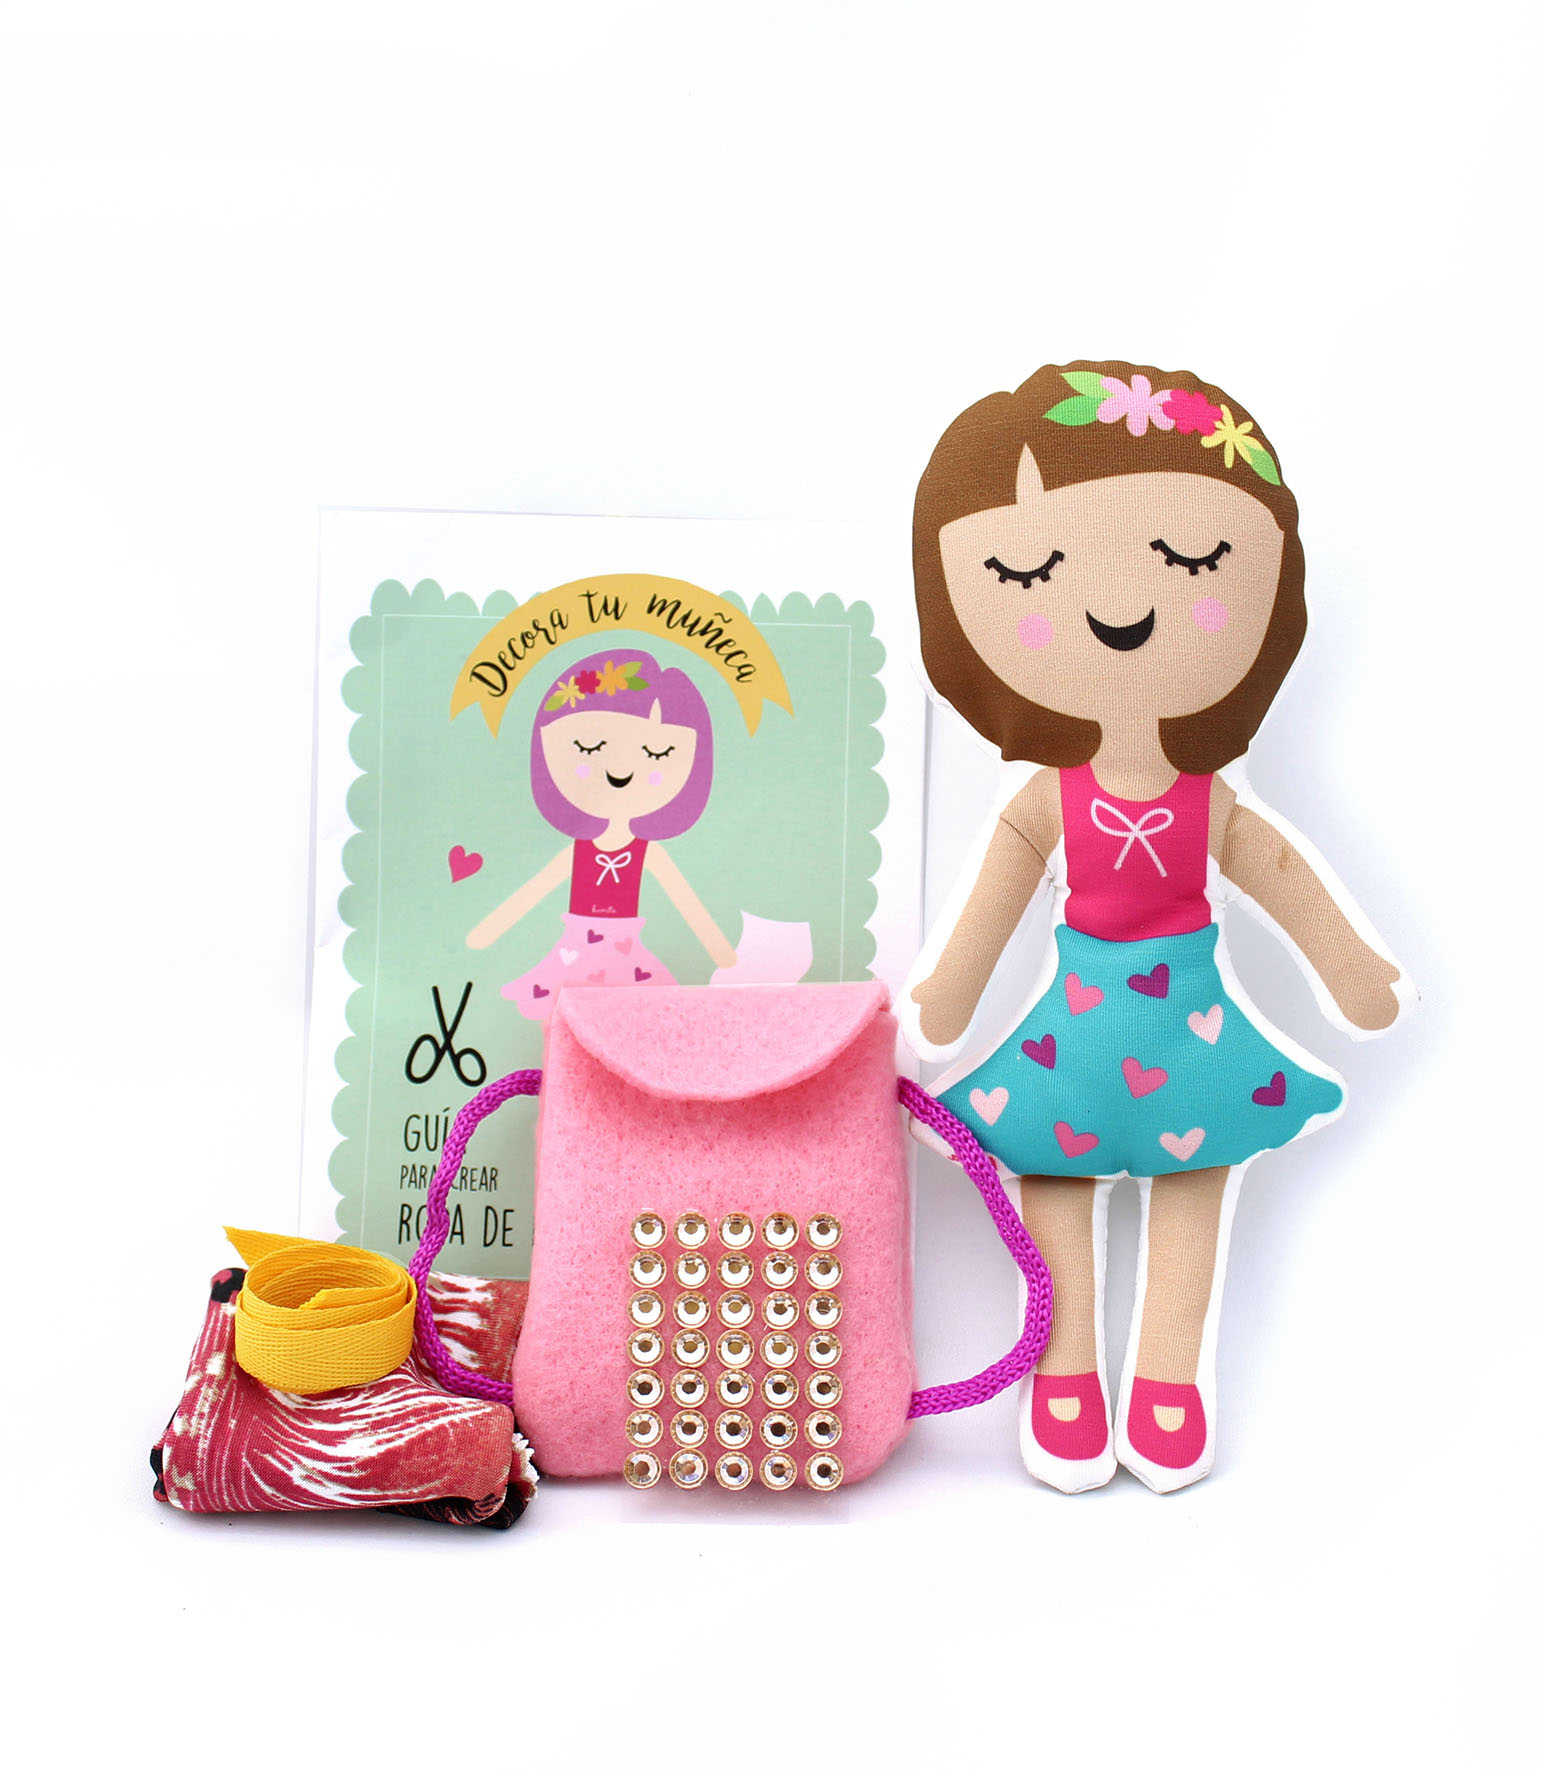 Muñeca con adornos